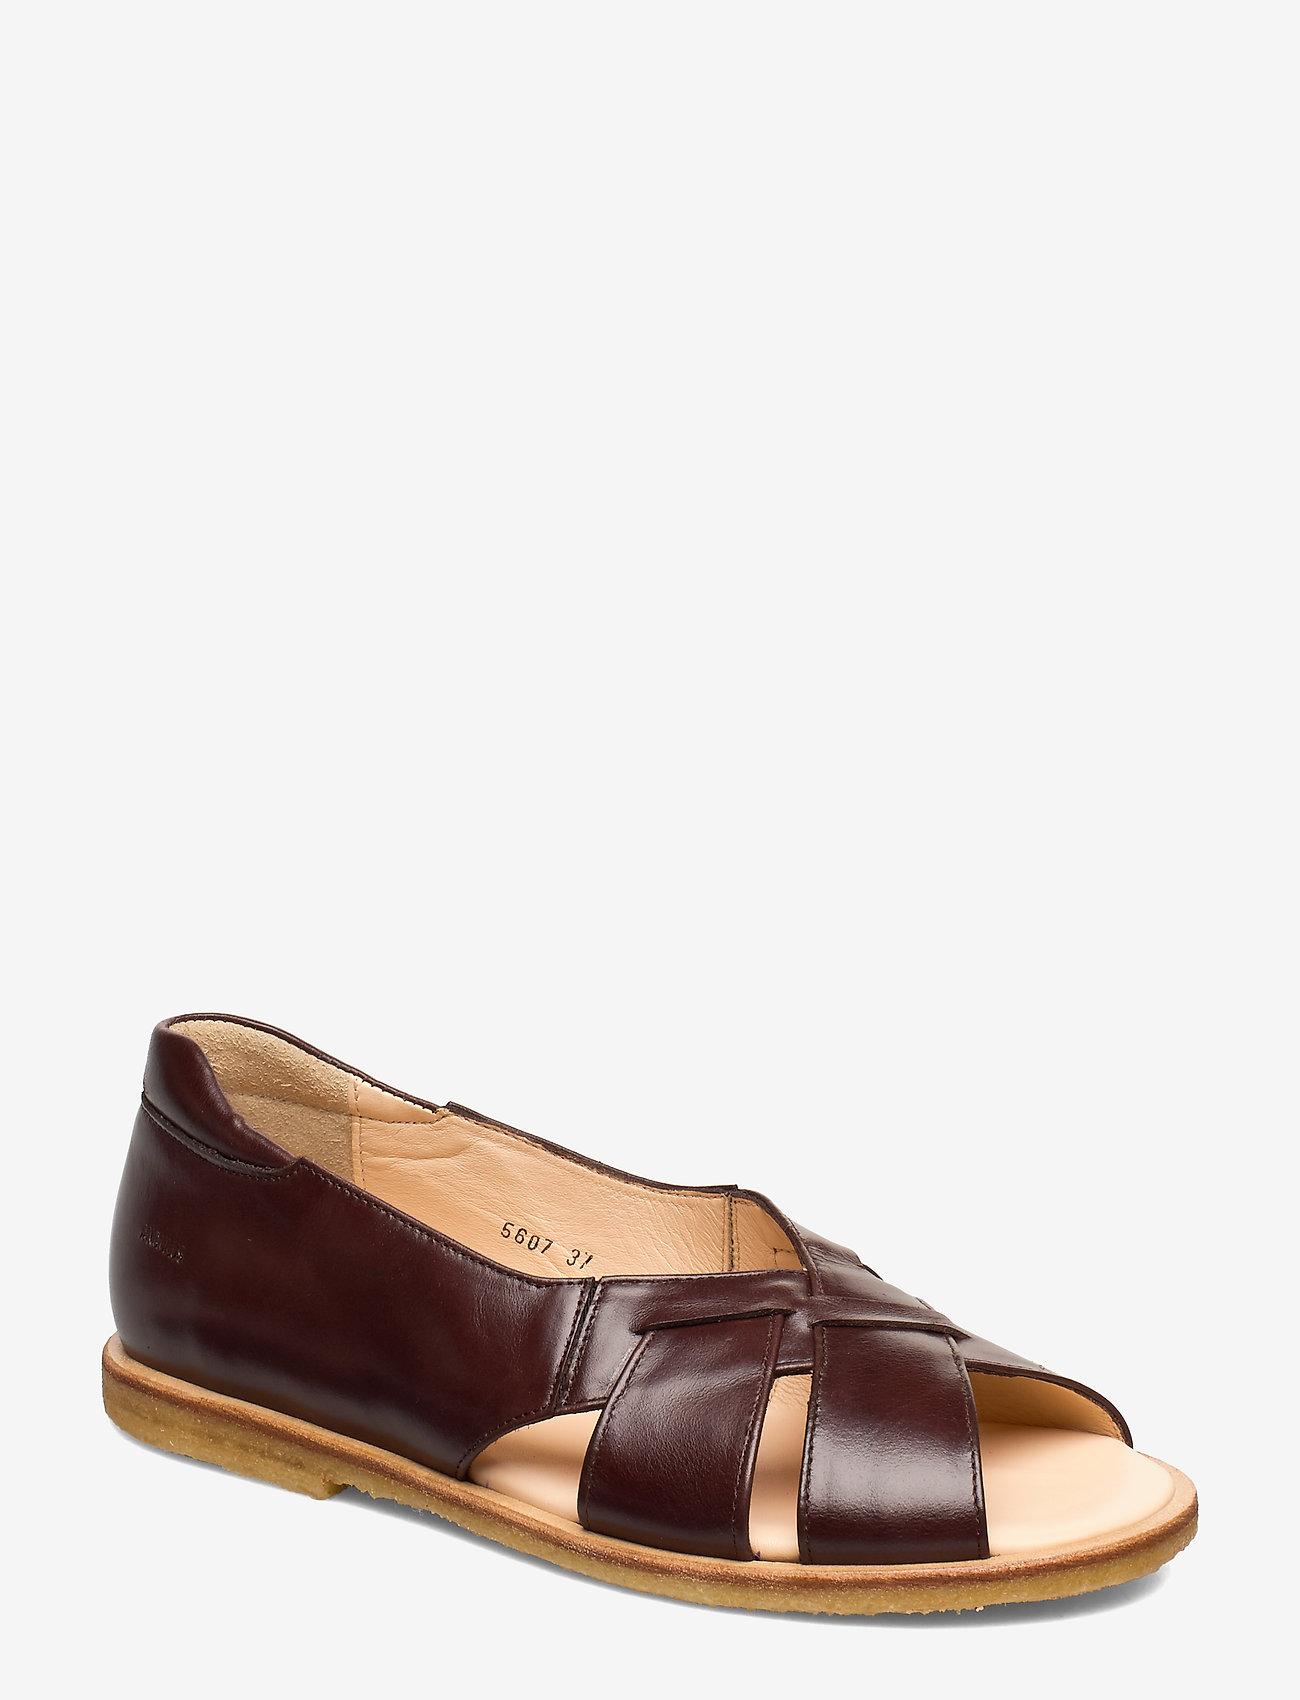 ANGULUS - Sandals - flat - open toe - op - flade sandaler - 1836/002 dark brown/dark brown - 0